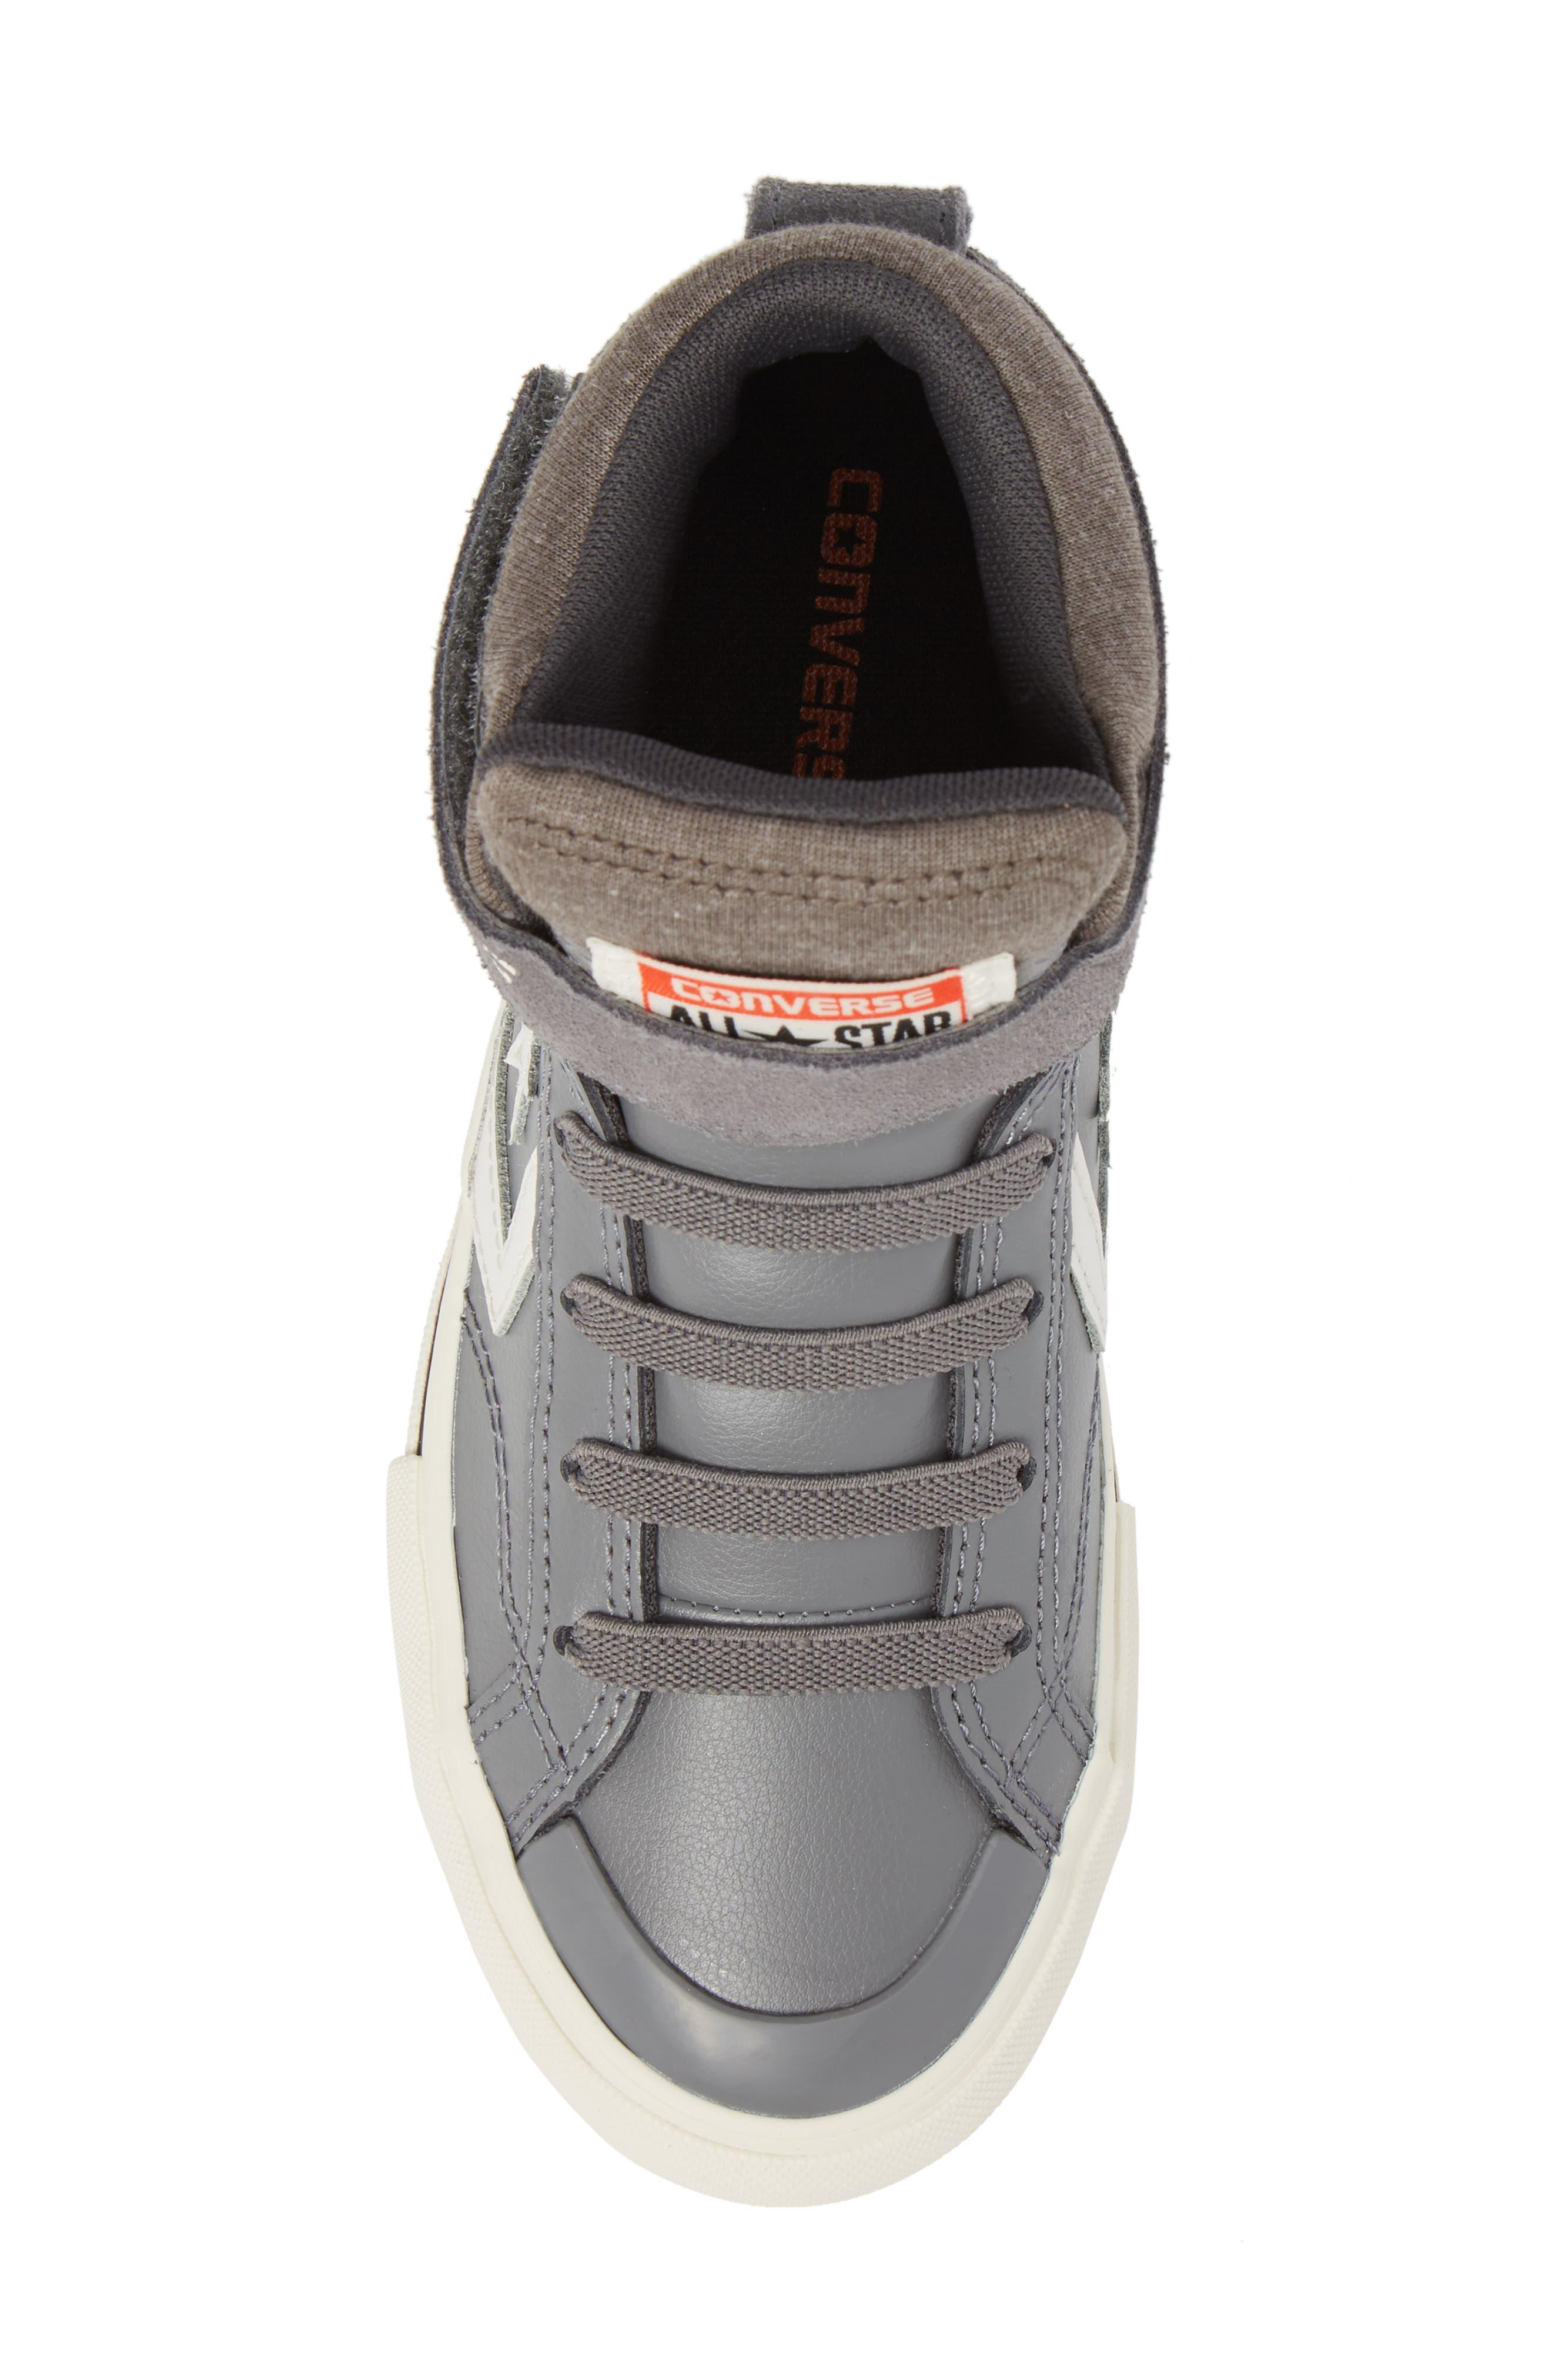 Pro Blaze High Top Sneaker,                             Alternate thumbnail 5, color,                             Mason Leather